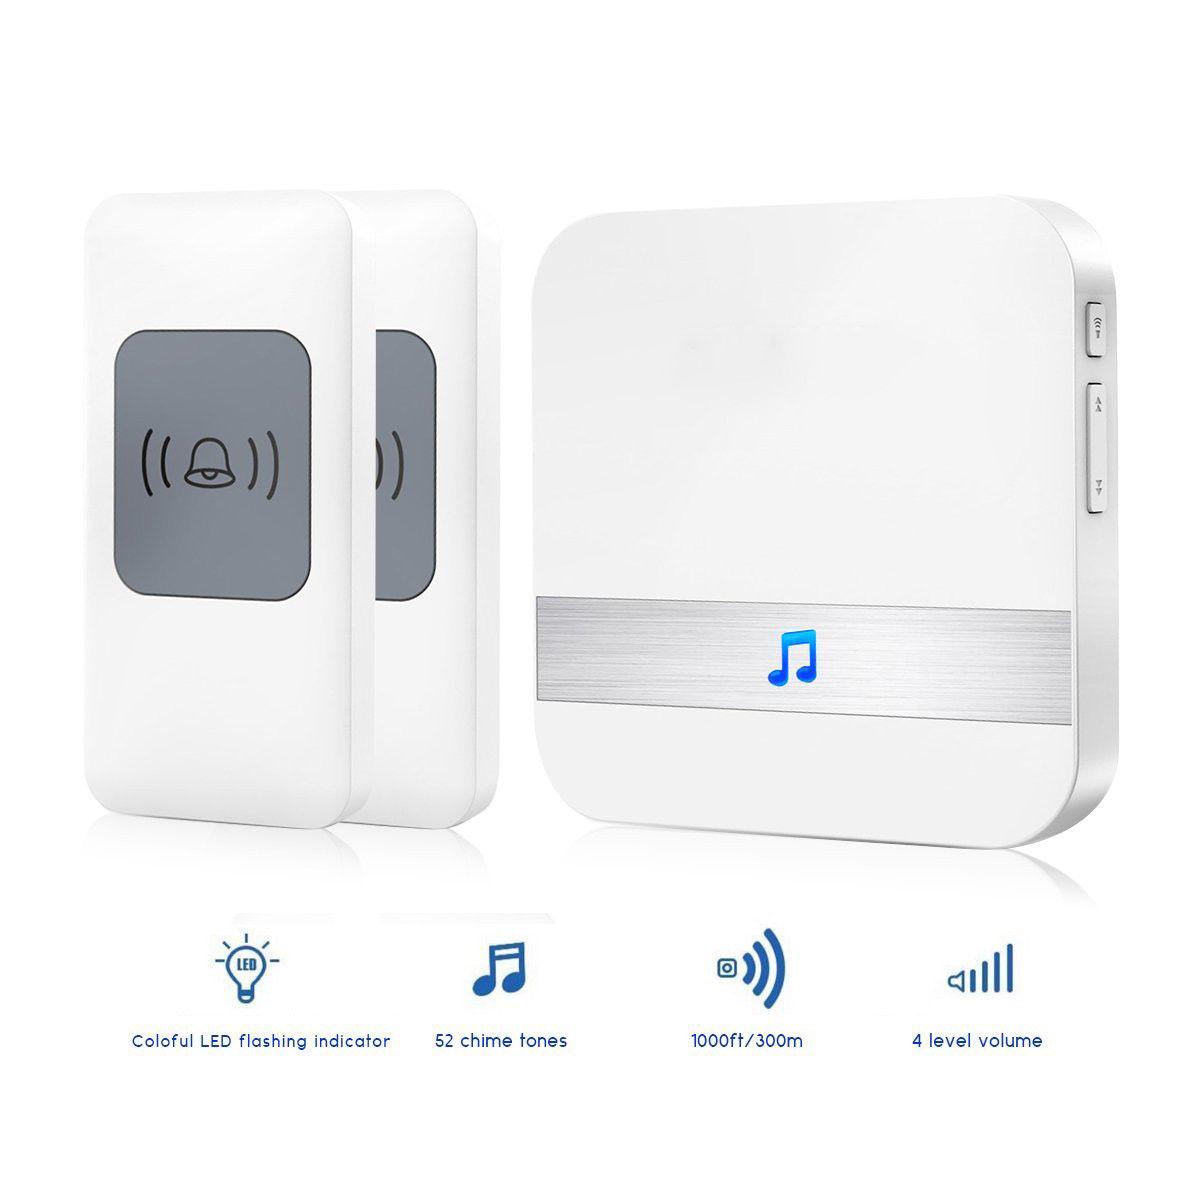 300M Waterproof Electronic Smart Home Wireless Doorbell 52 Songs Chime Door Bell European plug 1 * receiver+2 * button